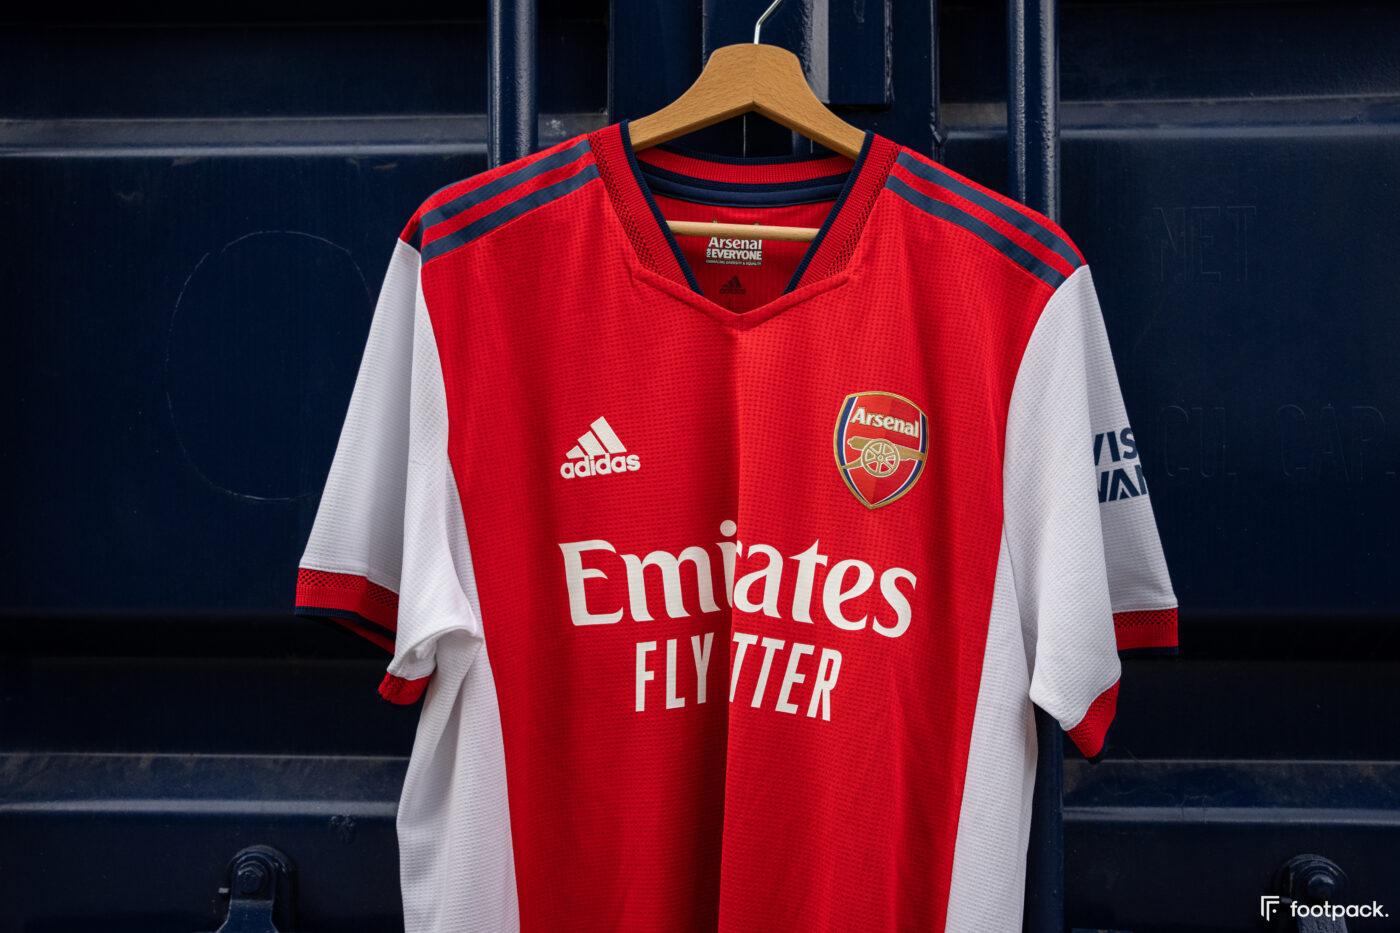 Maillot Arsenal 2021-2022 domicile - footpack